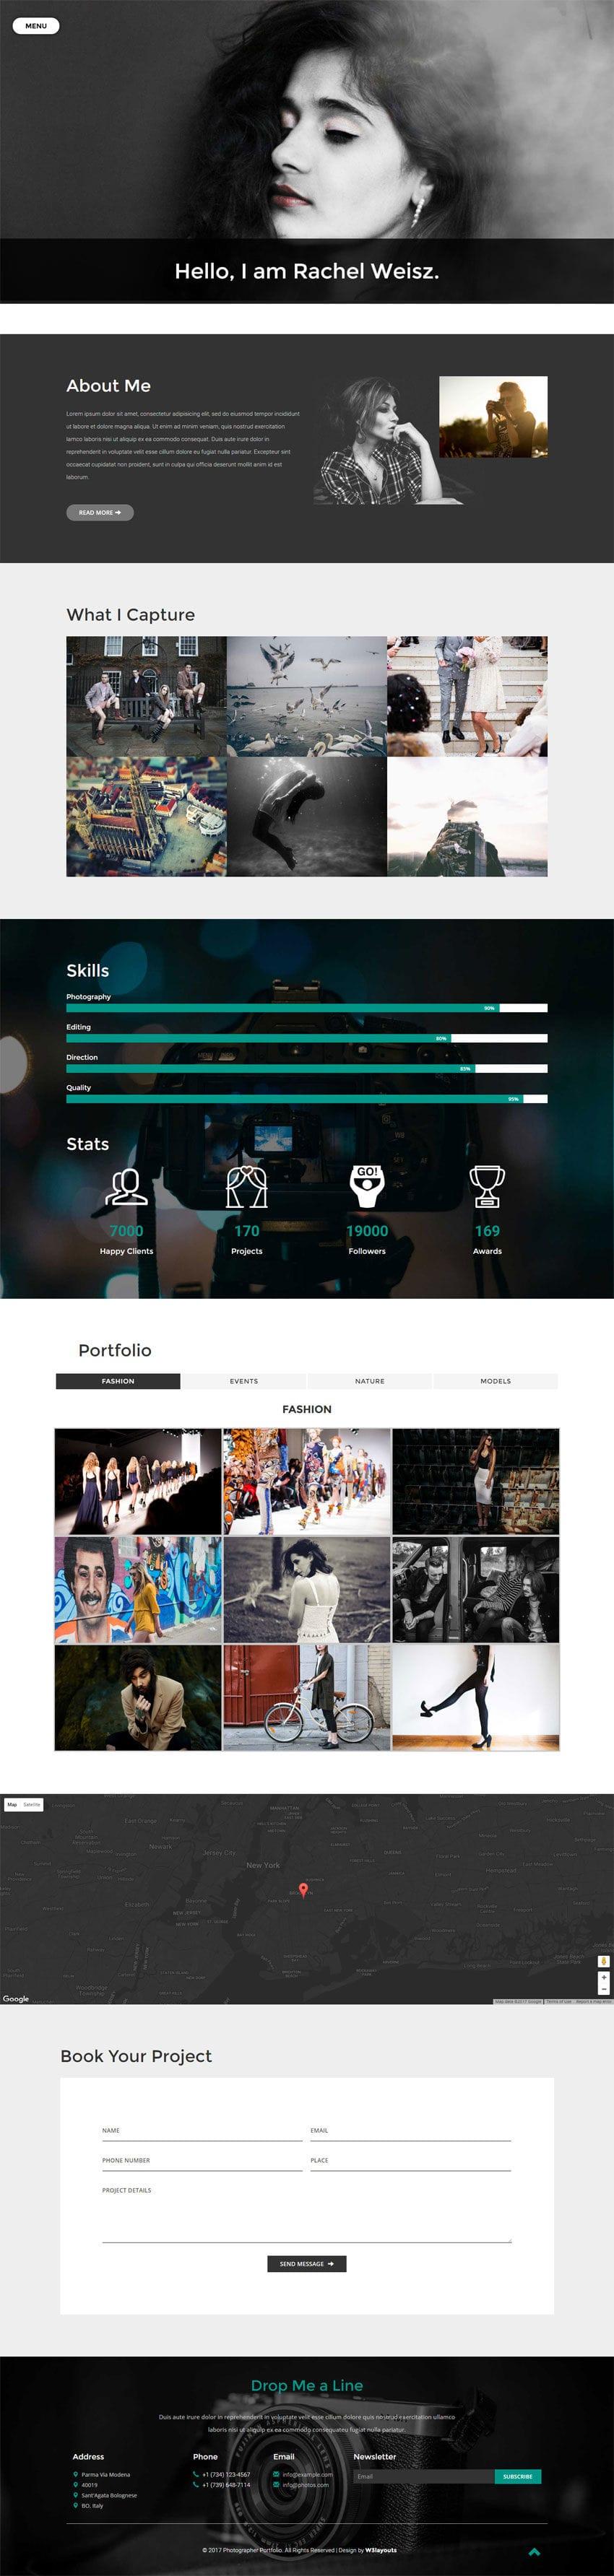 Photographer Portfolio Flat Bootstrap Responsive Web Template